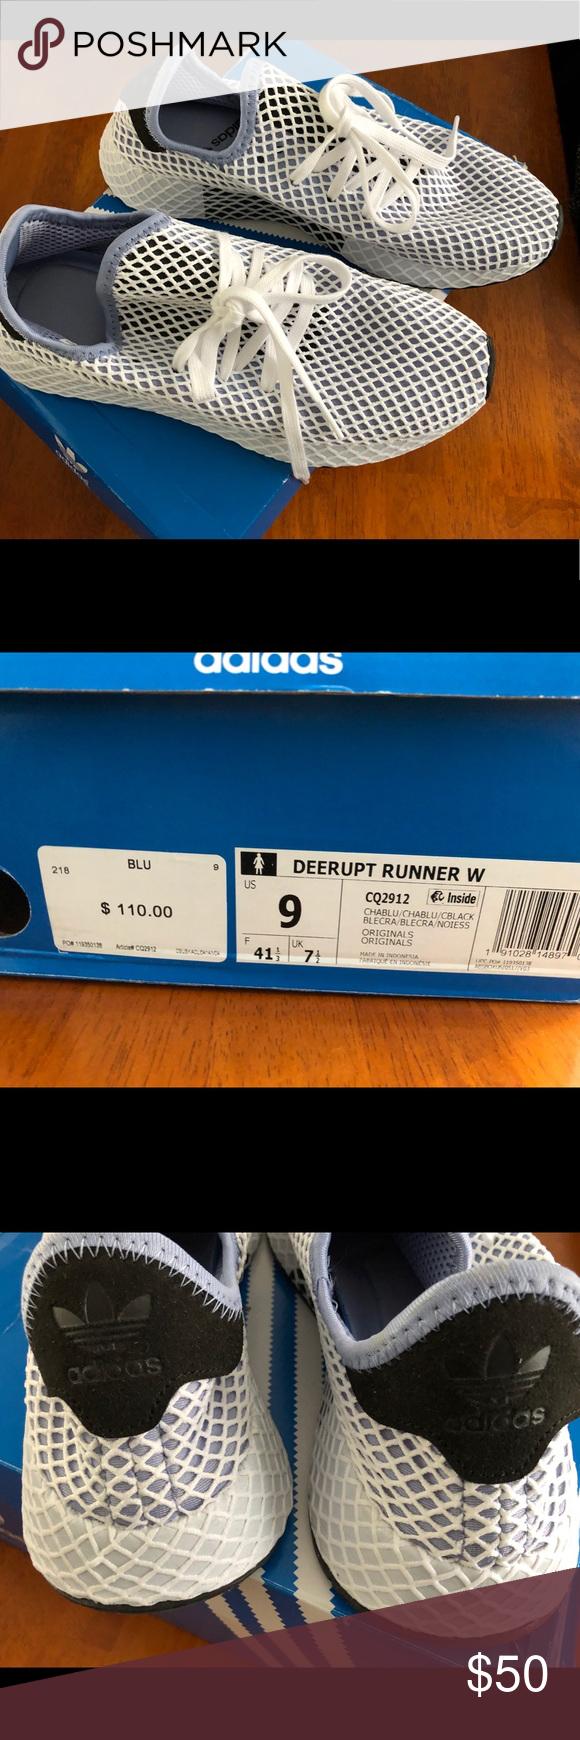 d5bea19de83ec ADIDAS Original Deerupt Runner Sneaker Shoes The adidas Originals Deerupt  Runner is a minimalist take on